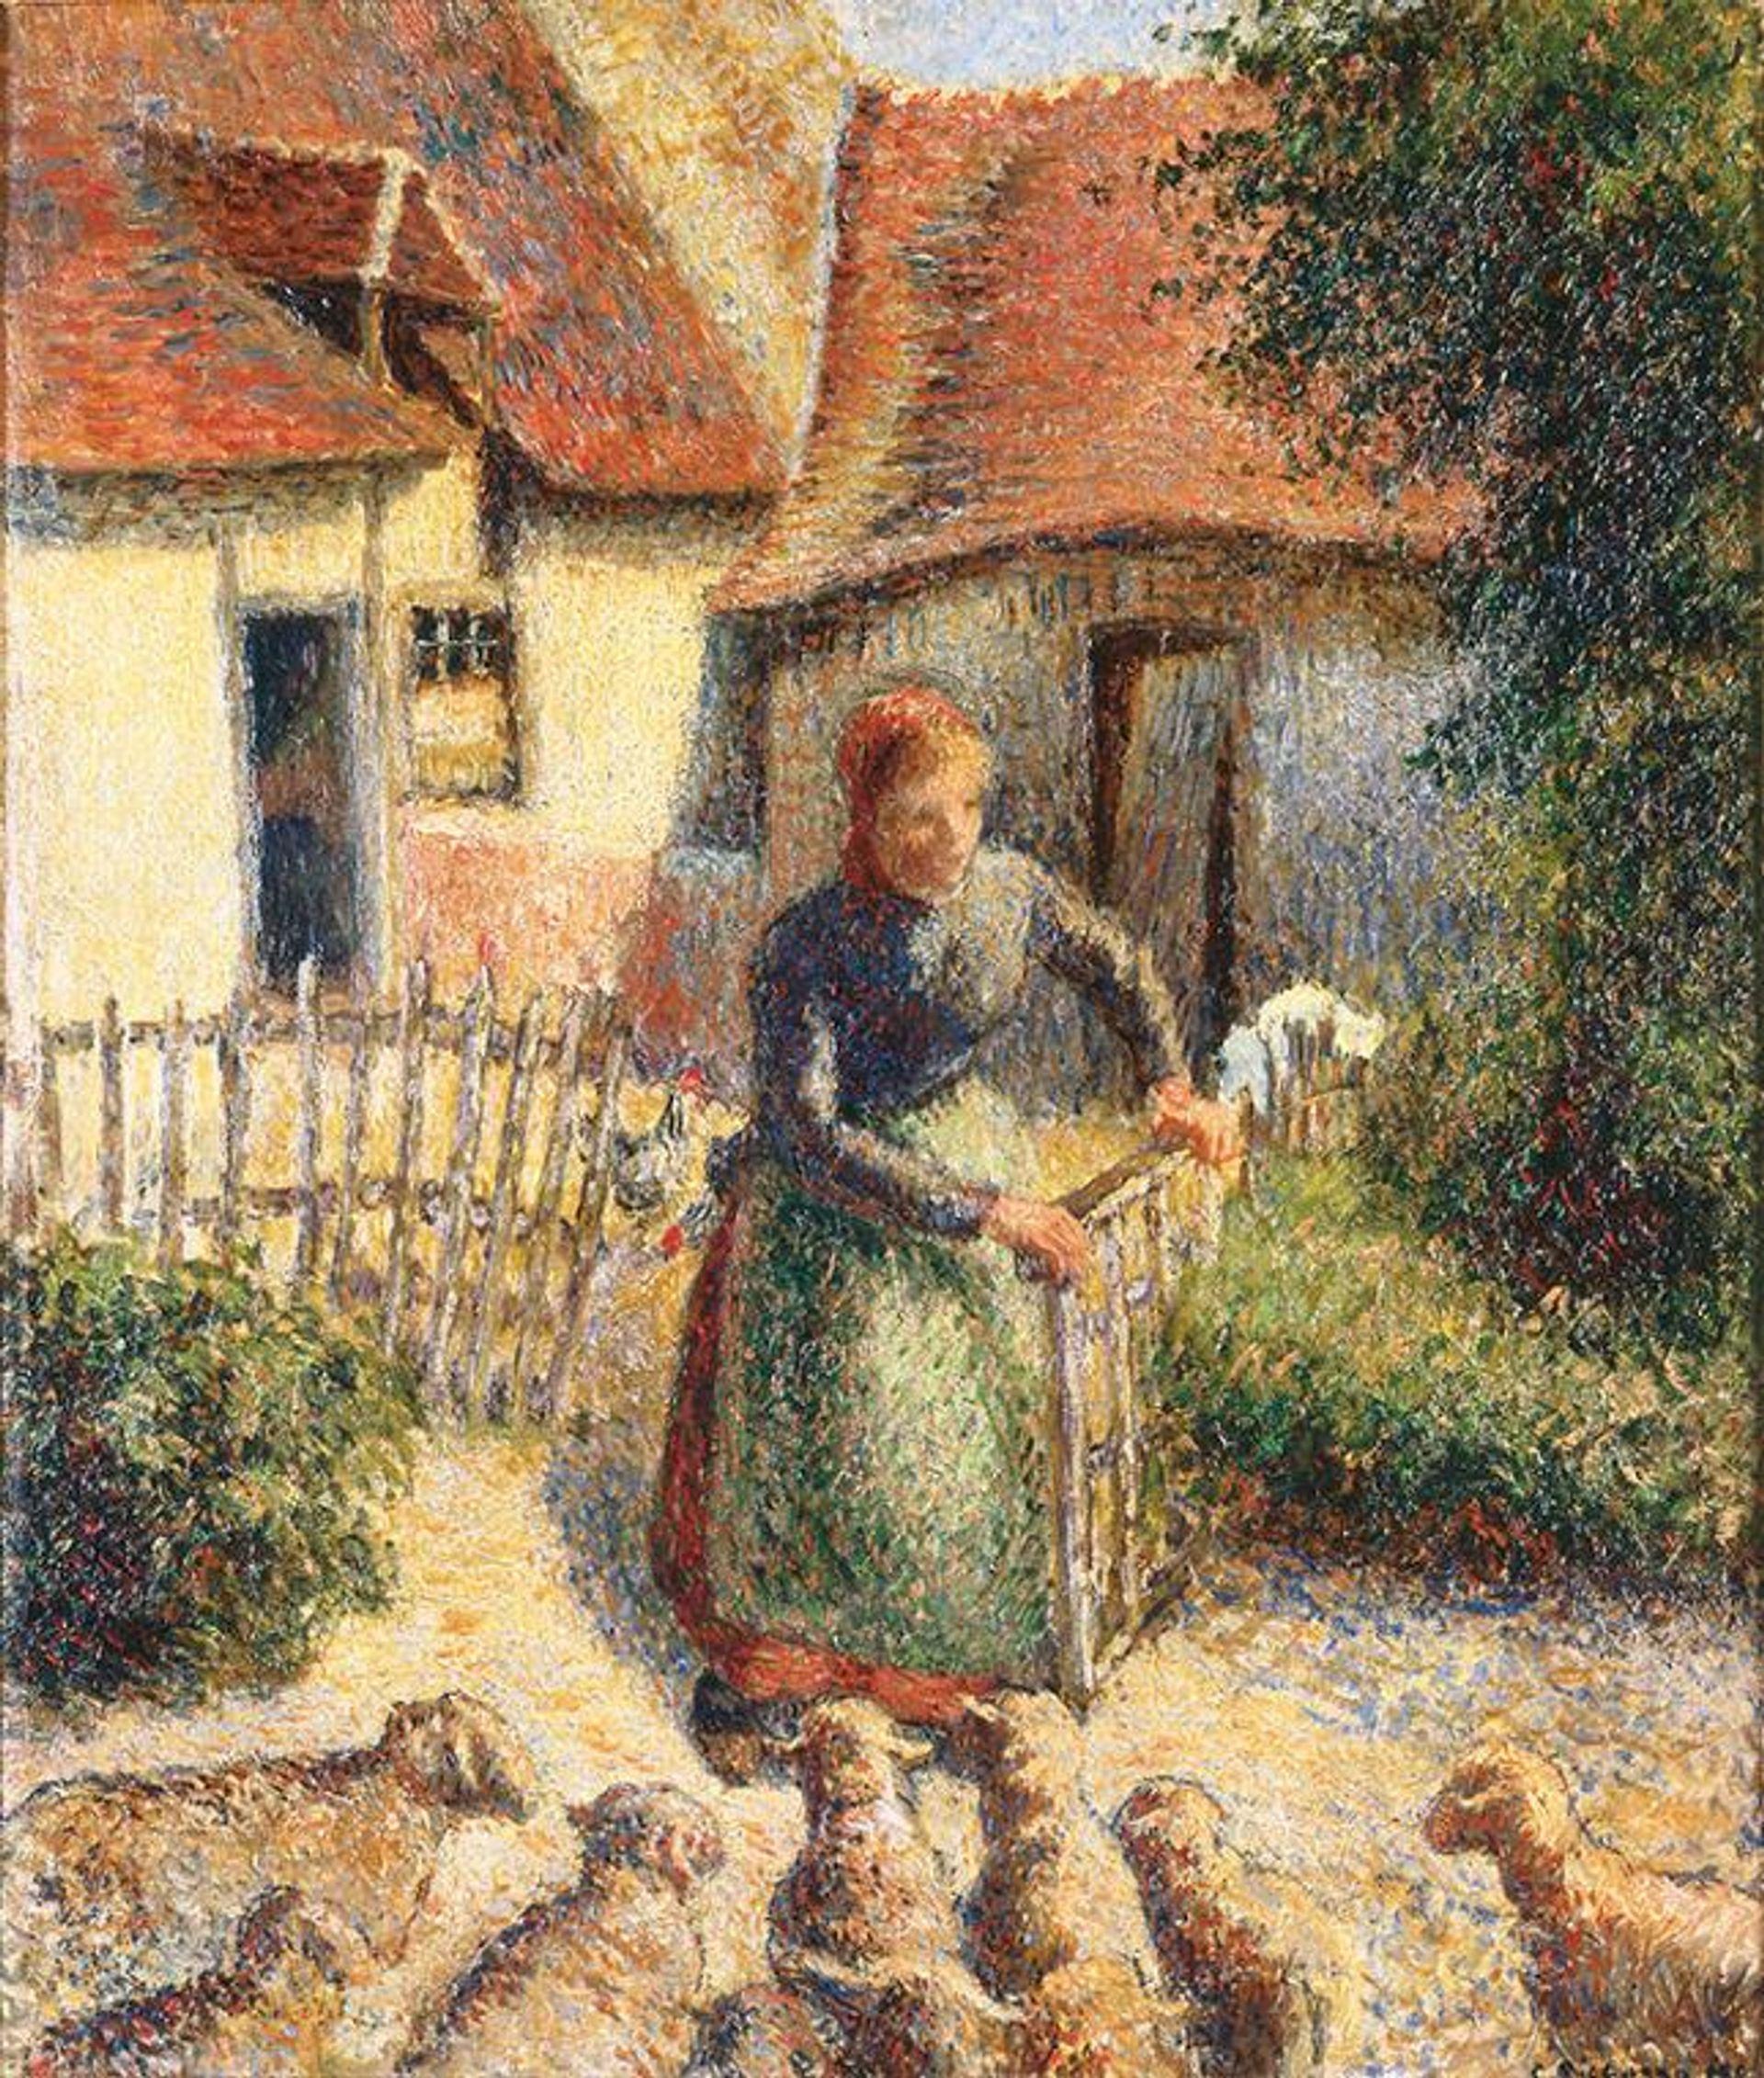 Camille Pissarro's La Bergère Rentrant des Moutons (or The Shepherdess Bringing in Sheep) (1886)